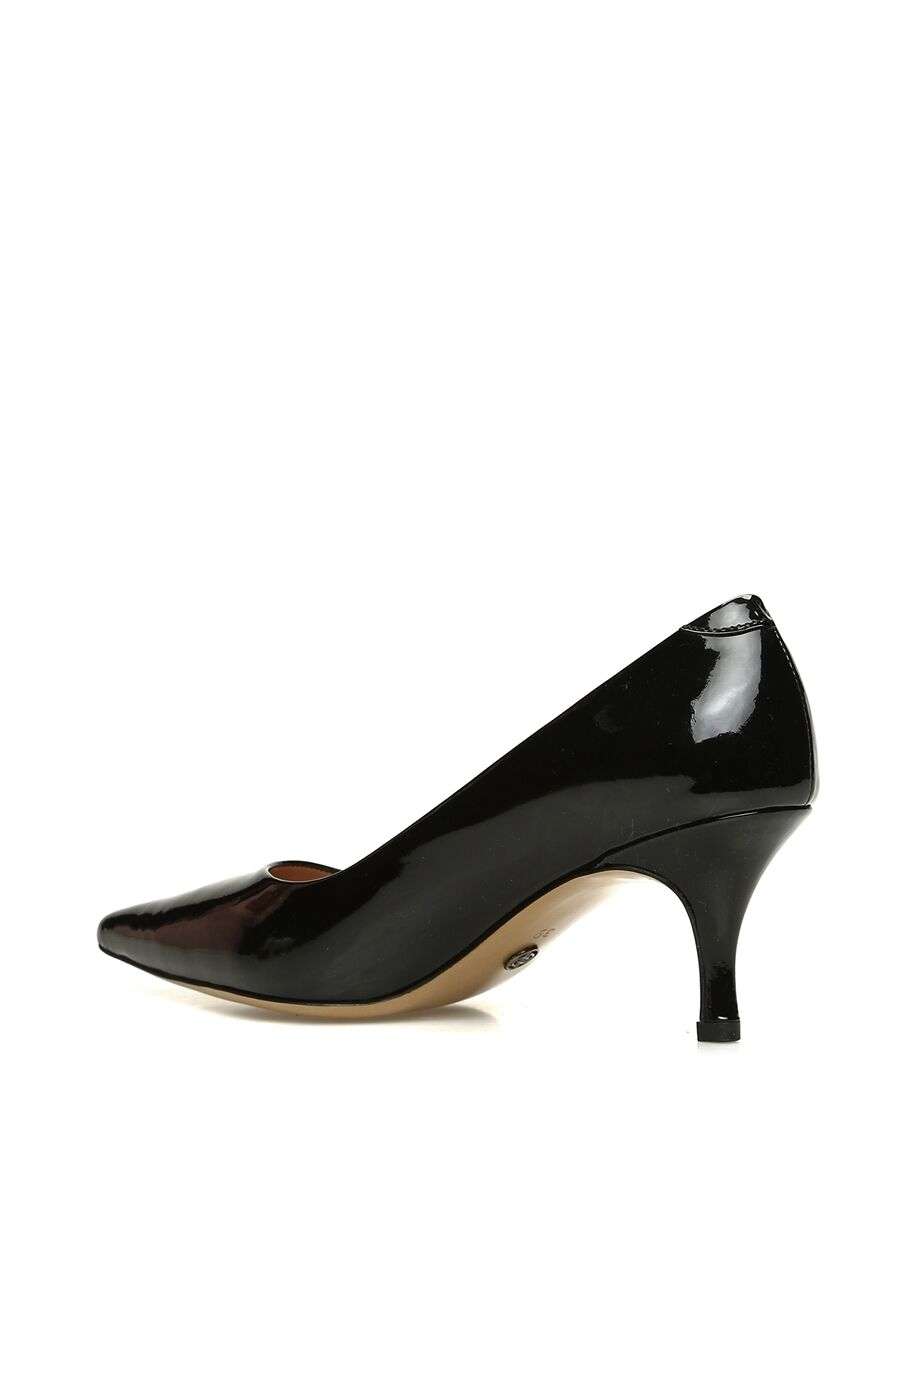 Kadın Siyah Rugan Topuklu Ayakkabı